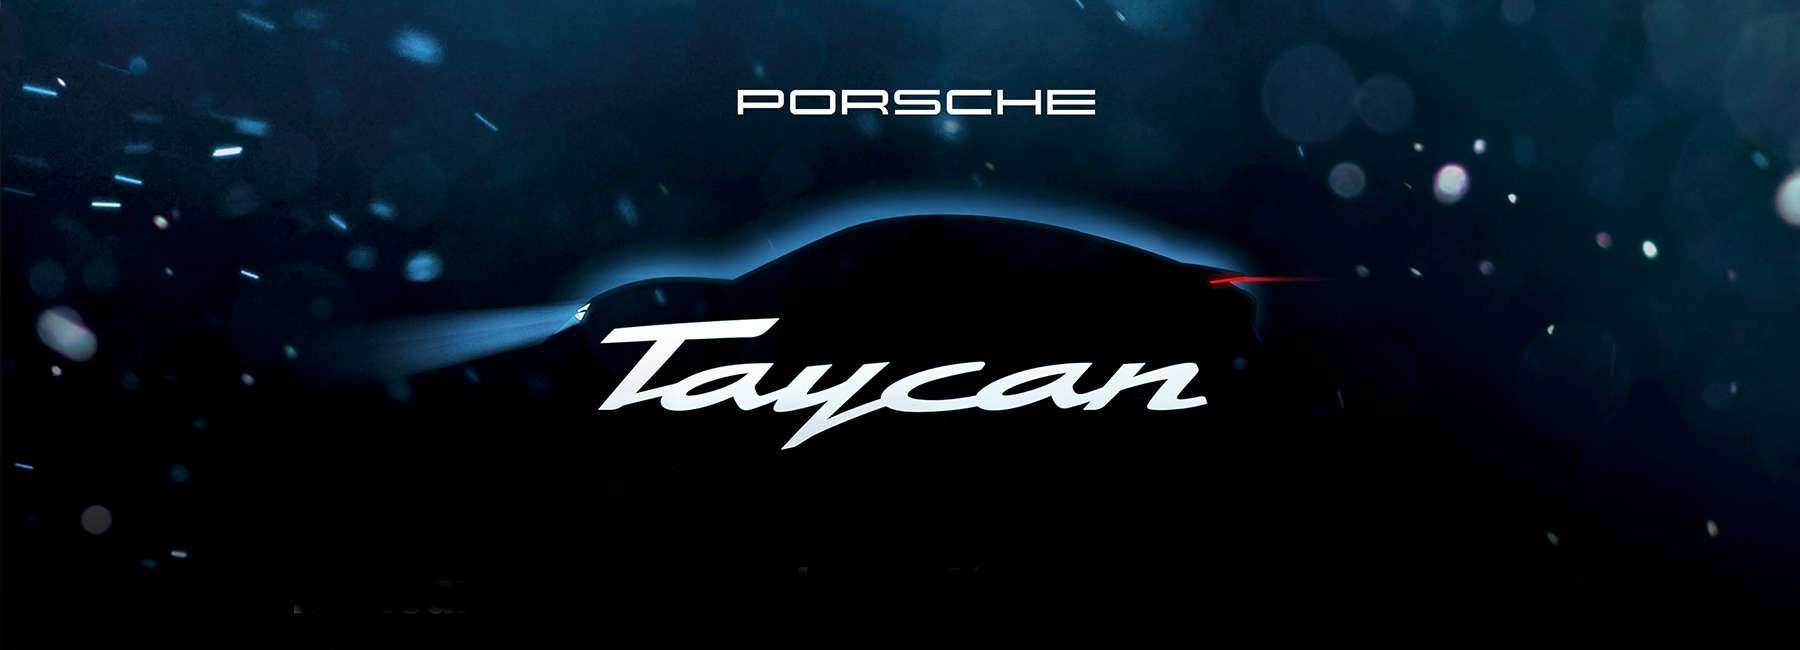 2020 Porsche Taycan Model Overview at Porsche Orland Park